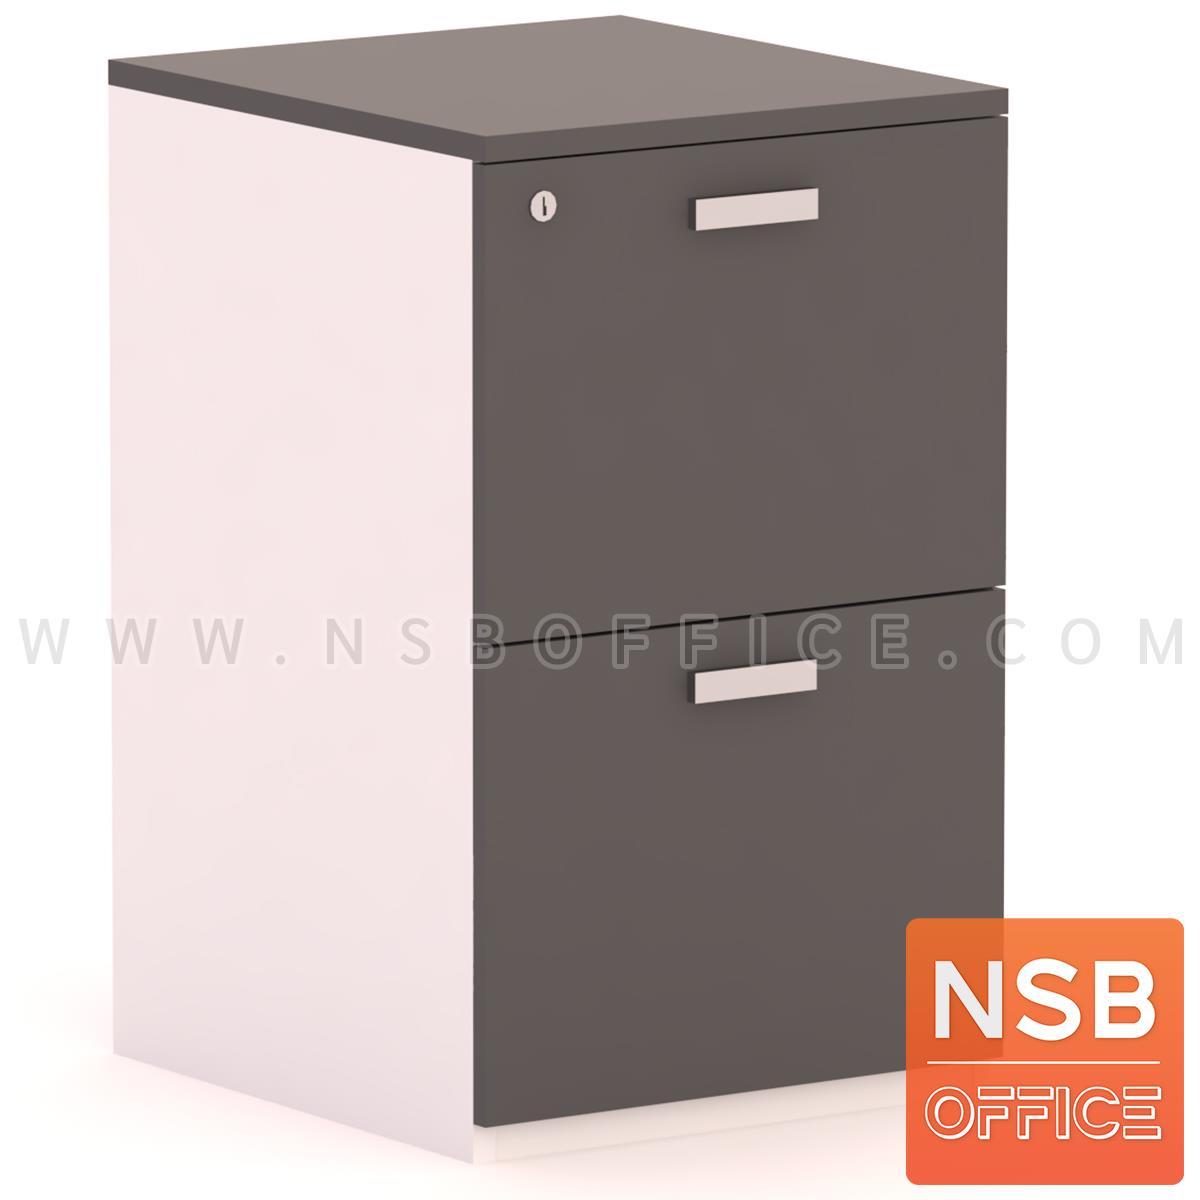 C01A018:ตู้ 2 ลิ้นชัก สูง 75 cm. สูงเสมอโต๊ะ รุ่น Wycombe (วิคัม)  เมลามีน